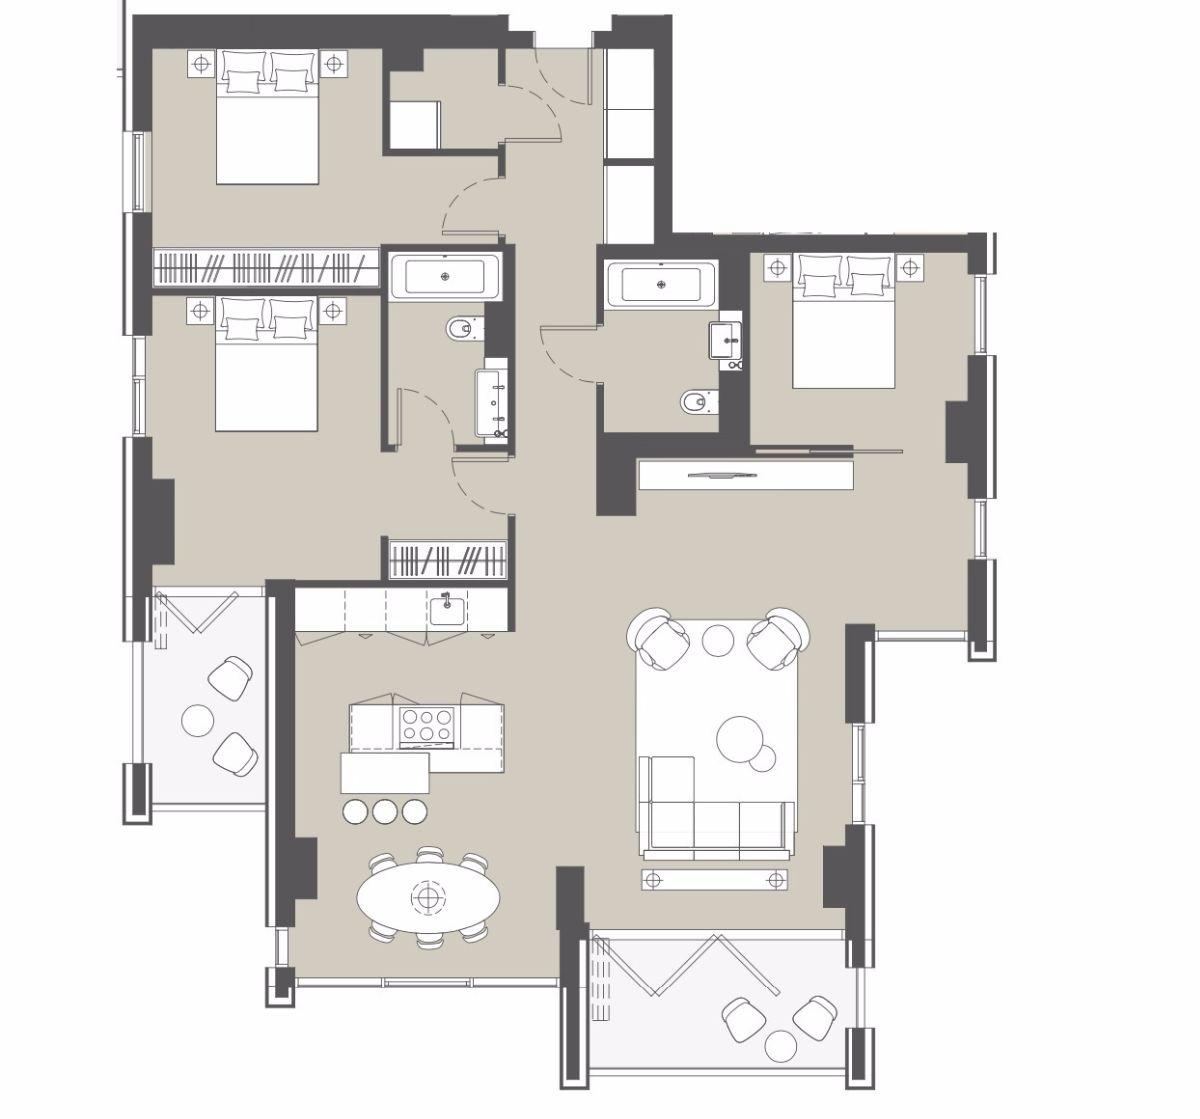 3 bedroom flat for sale in 145 City Road, EC1V, London